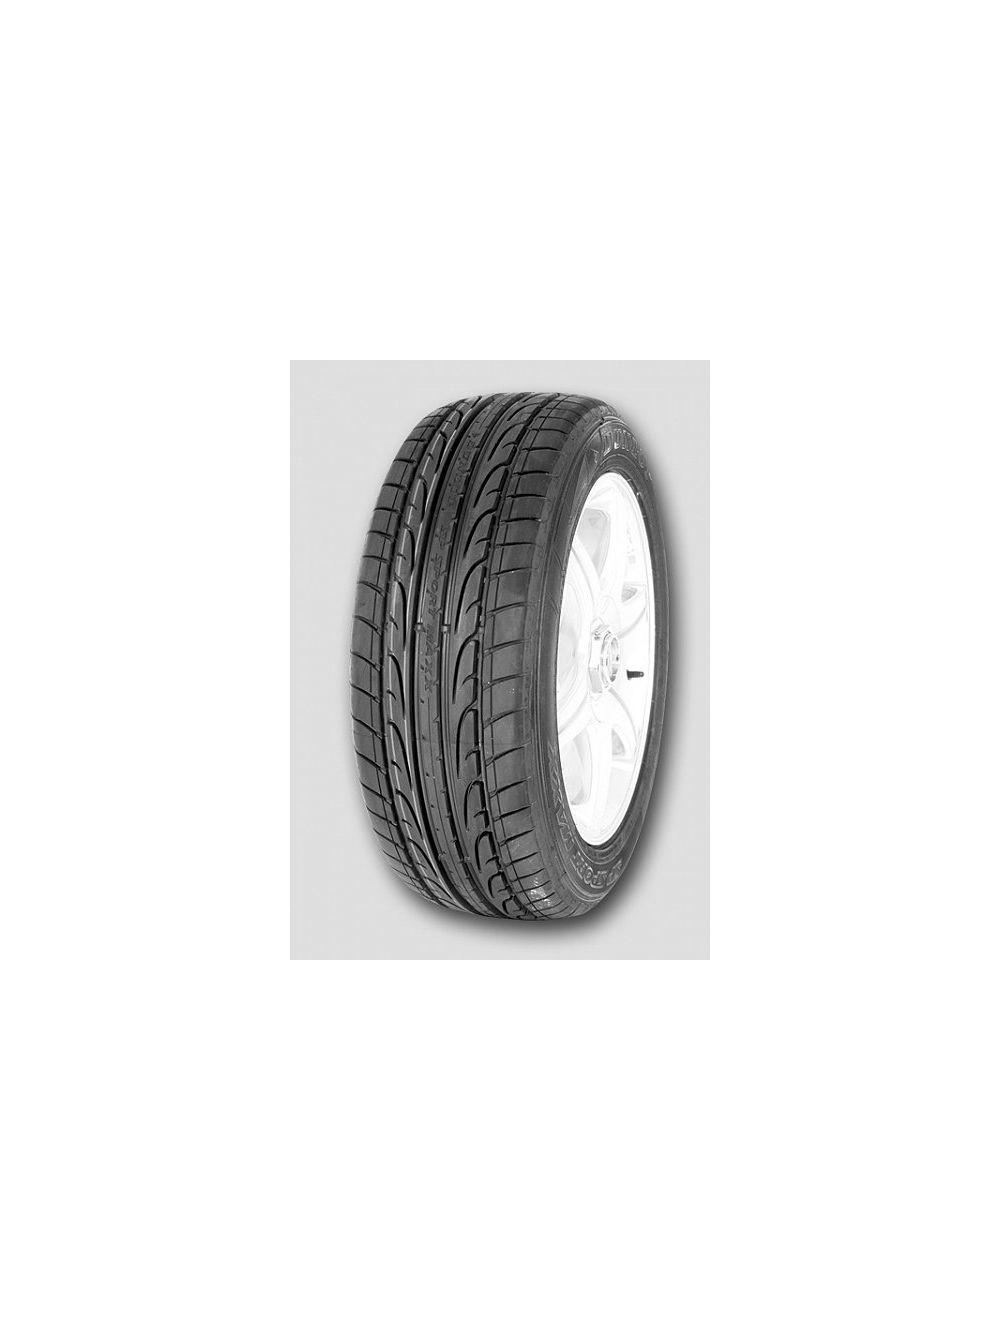 Dunlop 295/35R21 Y SP Sport MAXX XL RO1 MFS Nyári gumi